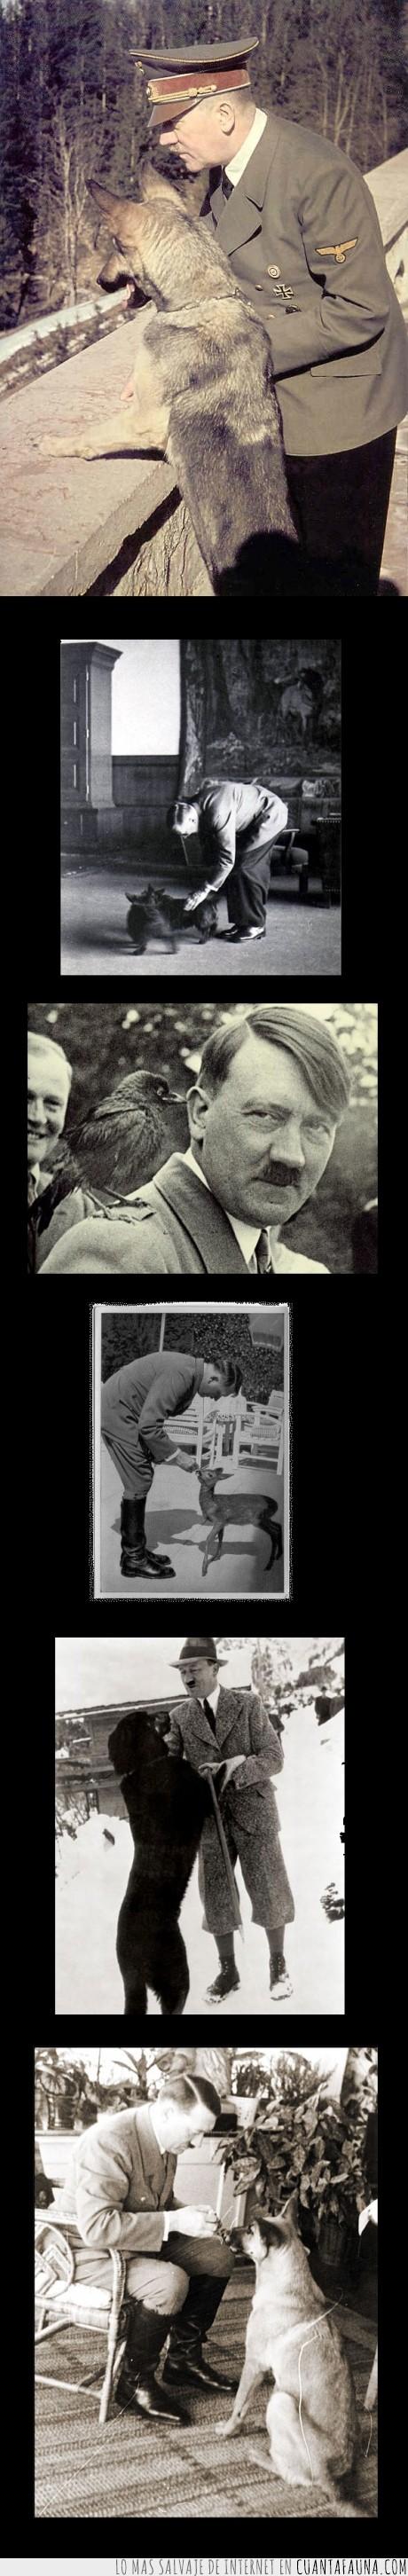 amante,animales,Hitler,odiar,perro,persona,vegetariano